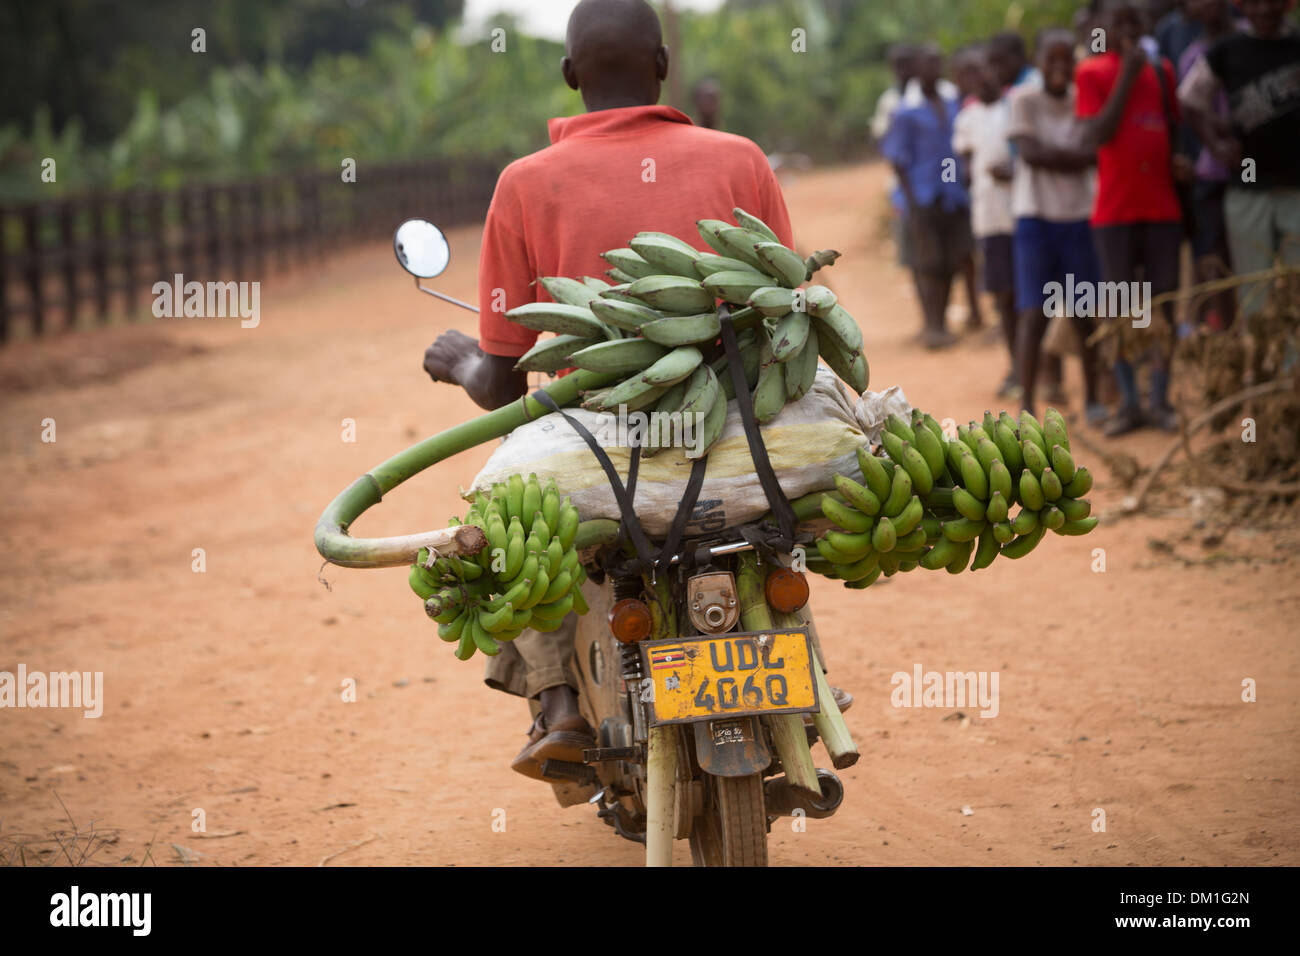 Bananas on the back of a motorcycle near Kampala, Uganda. - Stock Image